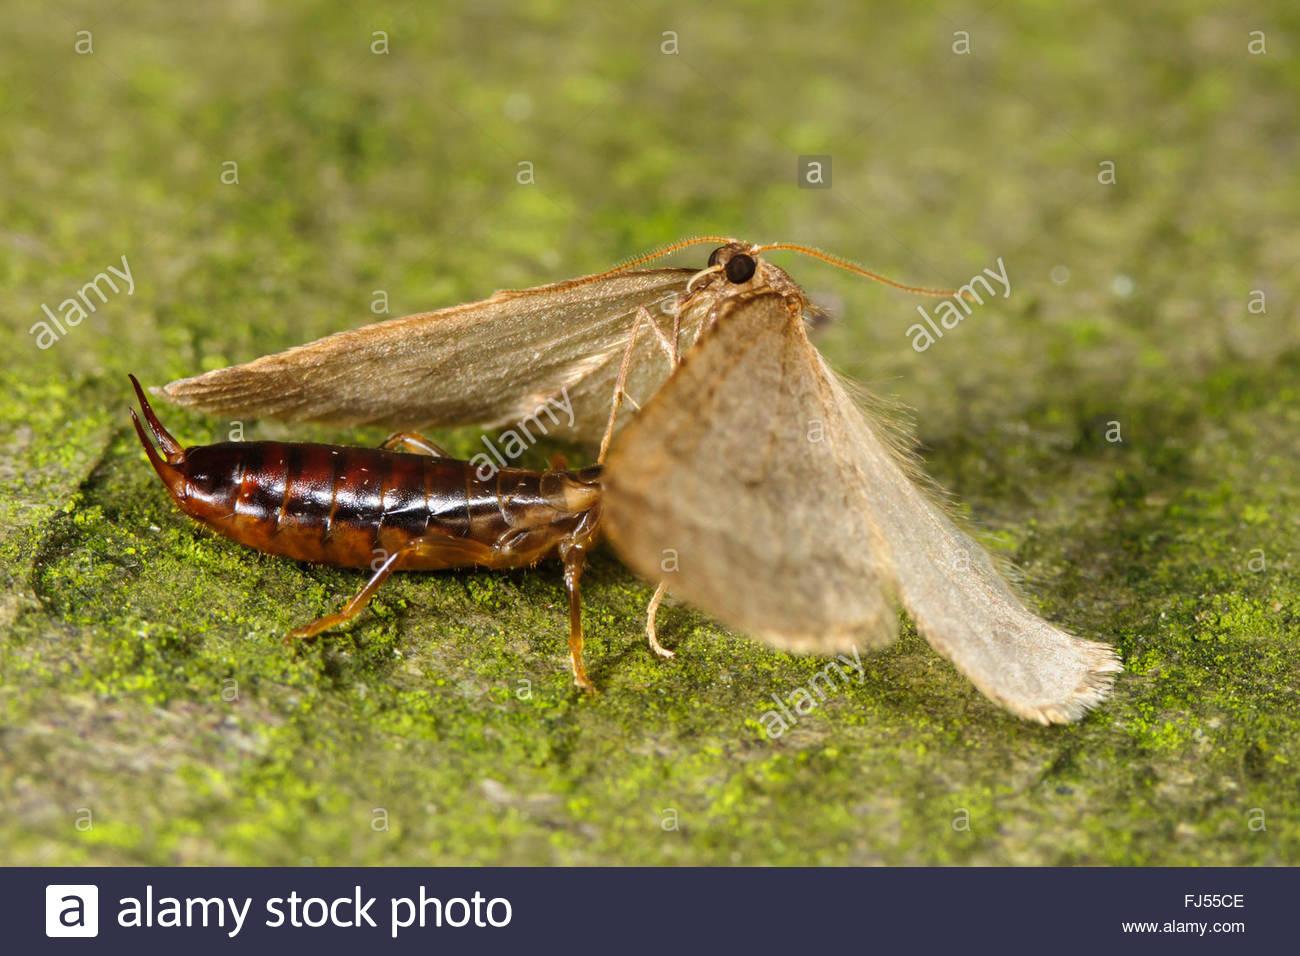 winter moth, small winter moth (Operophtera brumata, Cheimatobia brumata), earwig feeds male winter moth, Germany - Stock Image